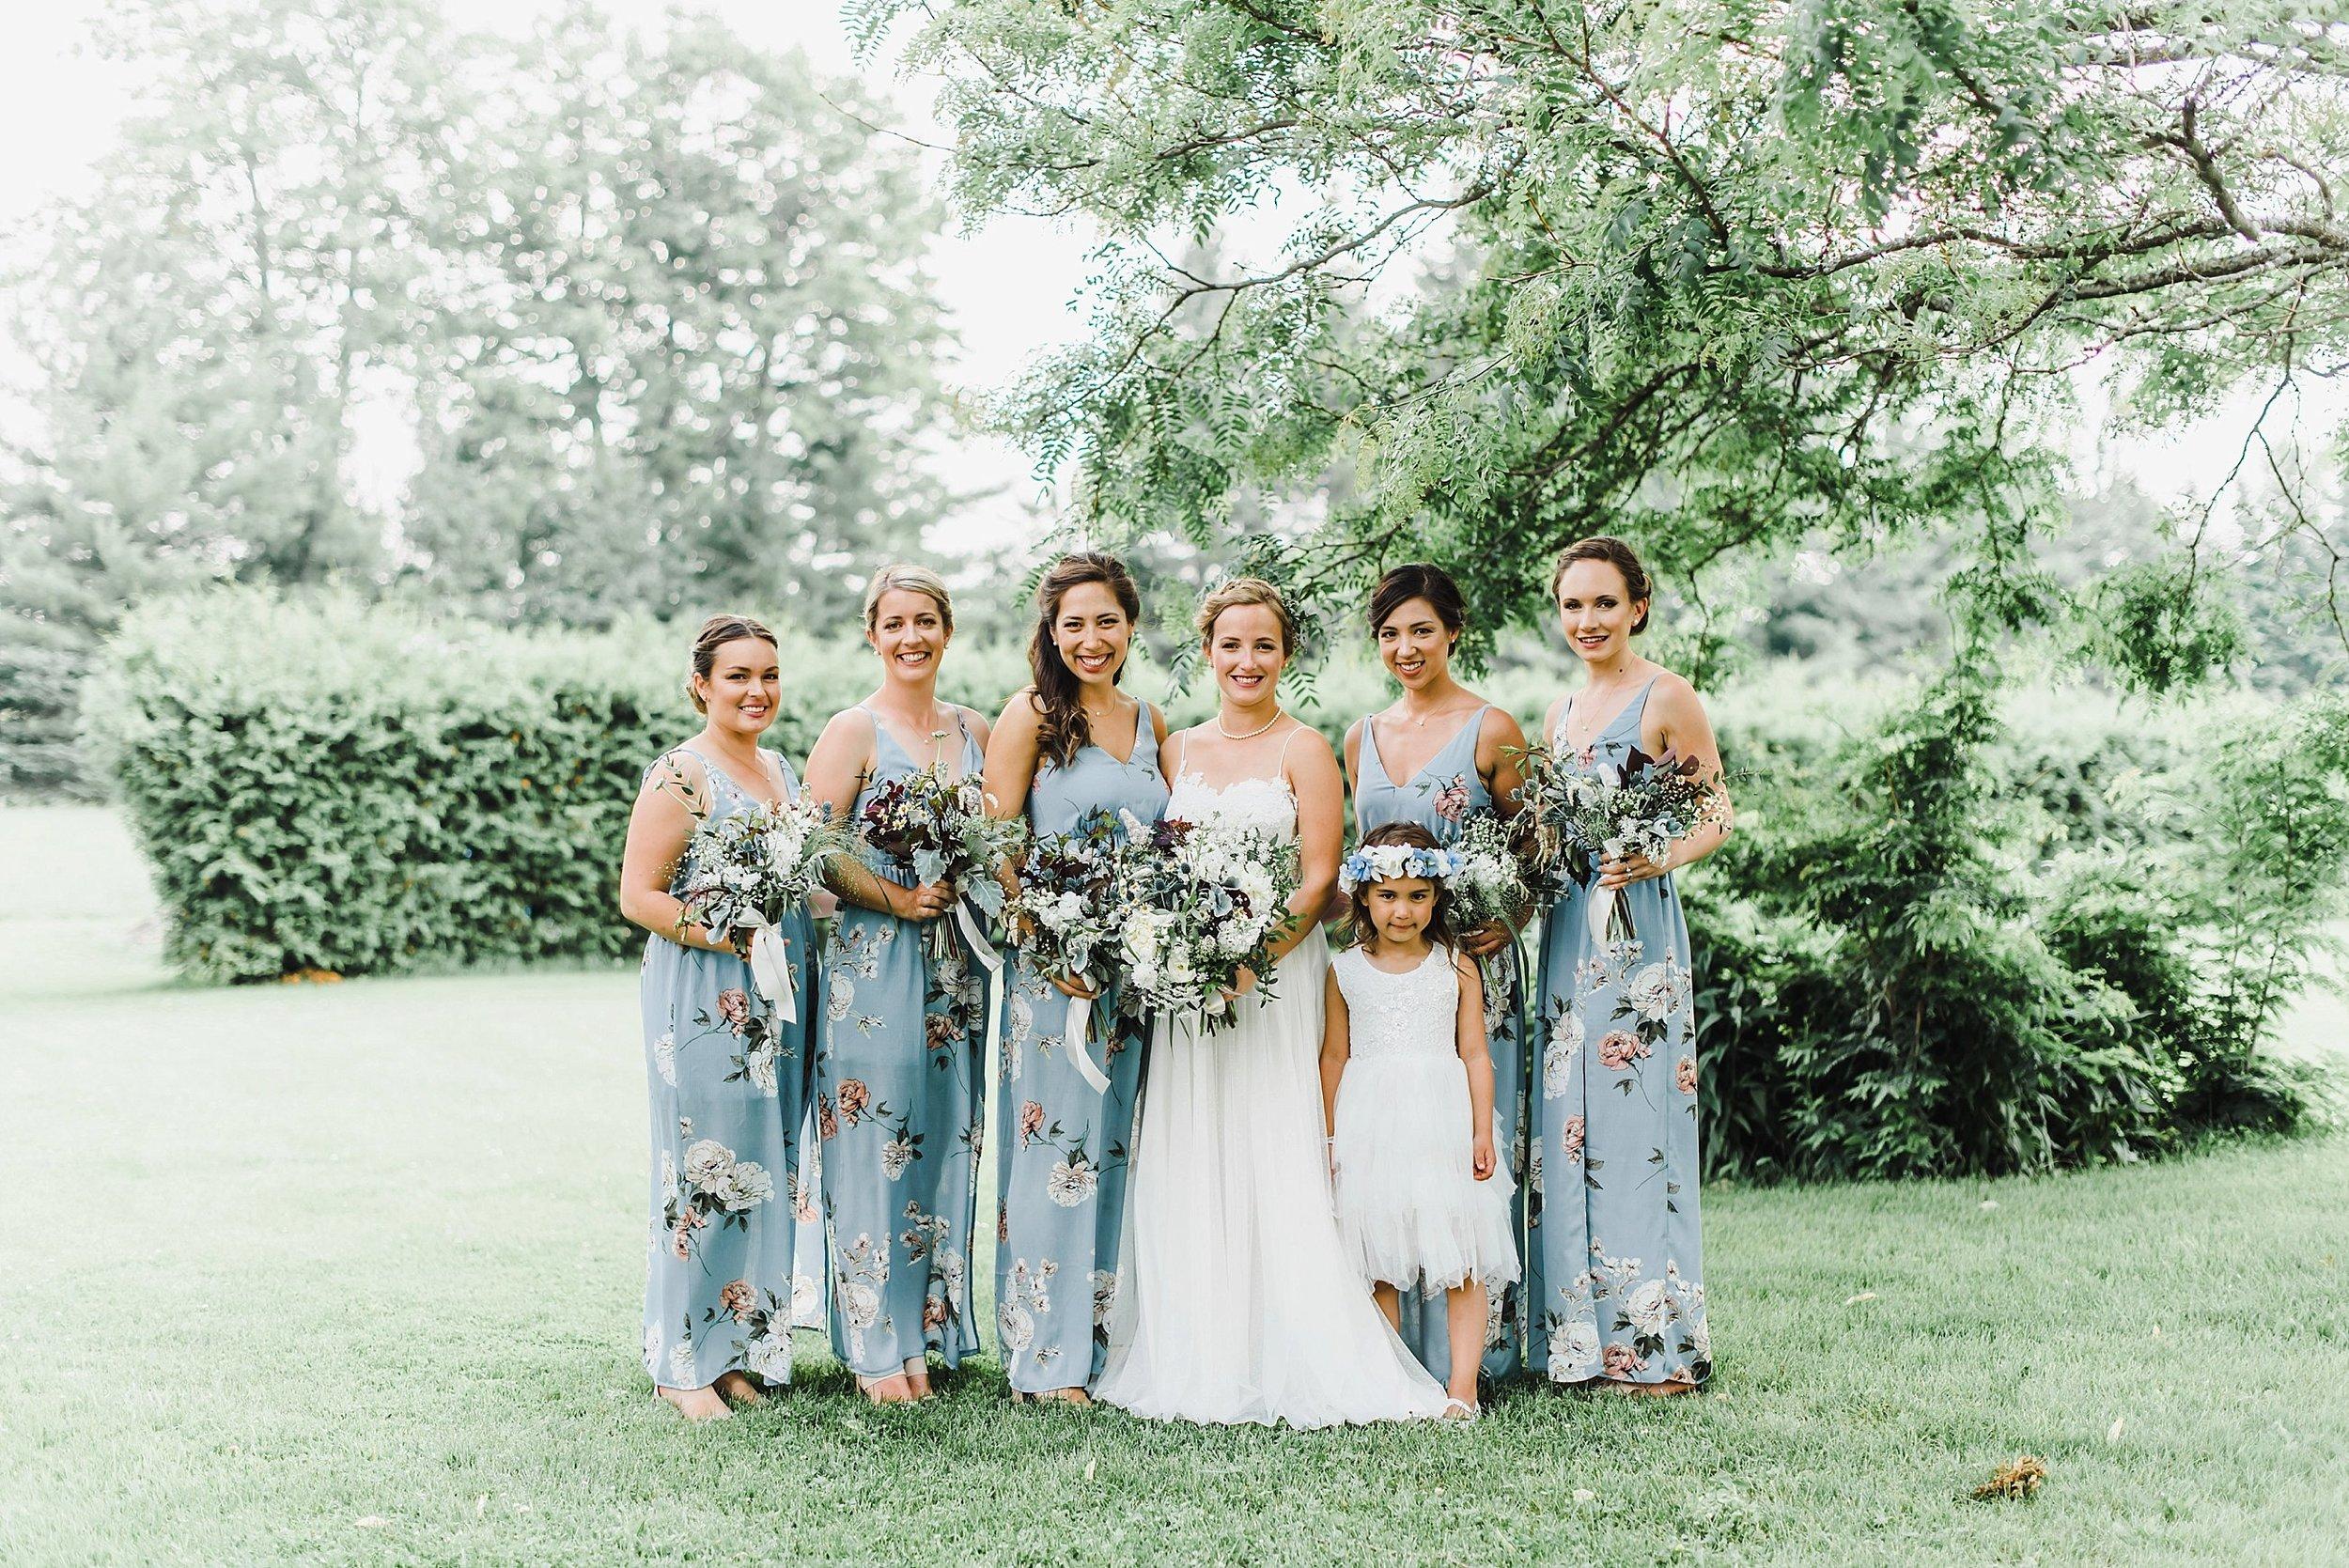 light airy indie fine art ottawa wedding photographer | Ali and Batoul Photography_0830.jpg